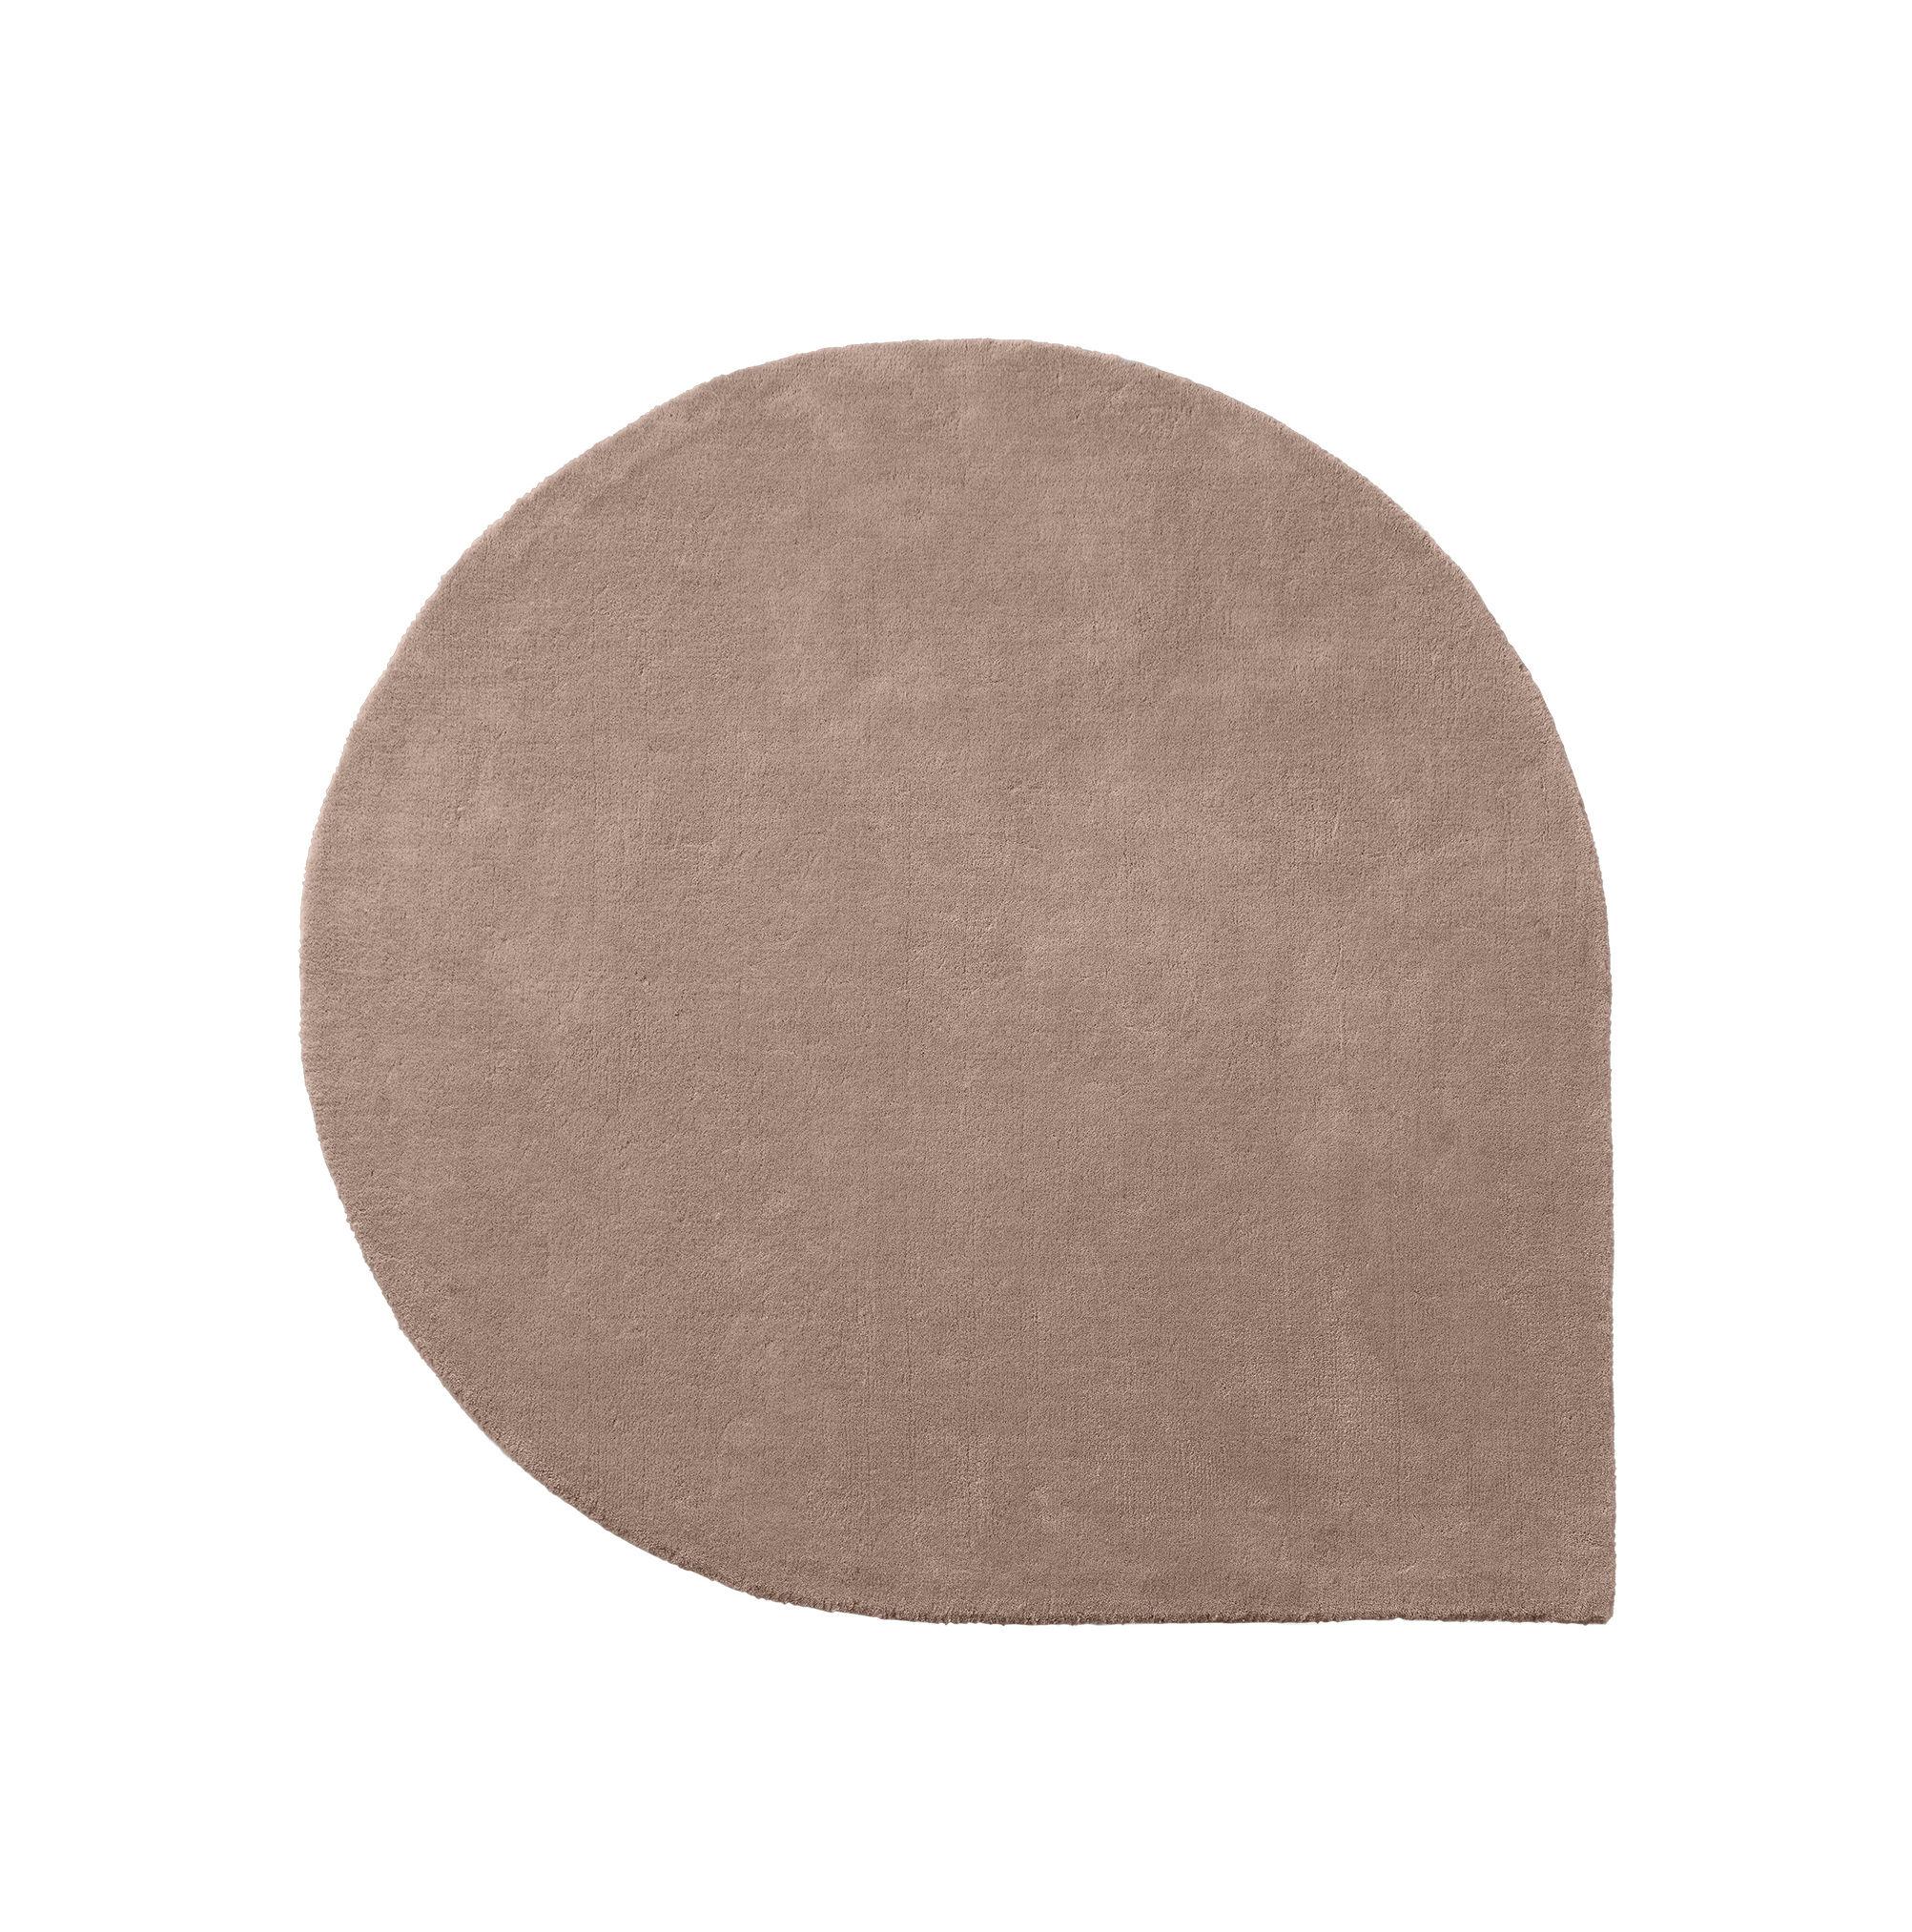 Tapis stilla 160 x 130 cm tuft main rose ancien - Made in design tapis ...